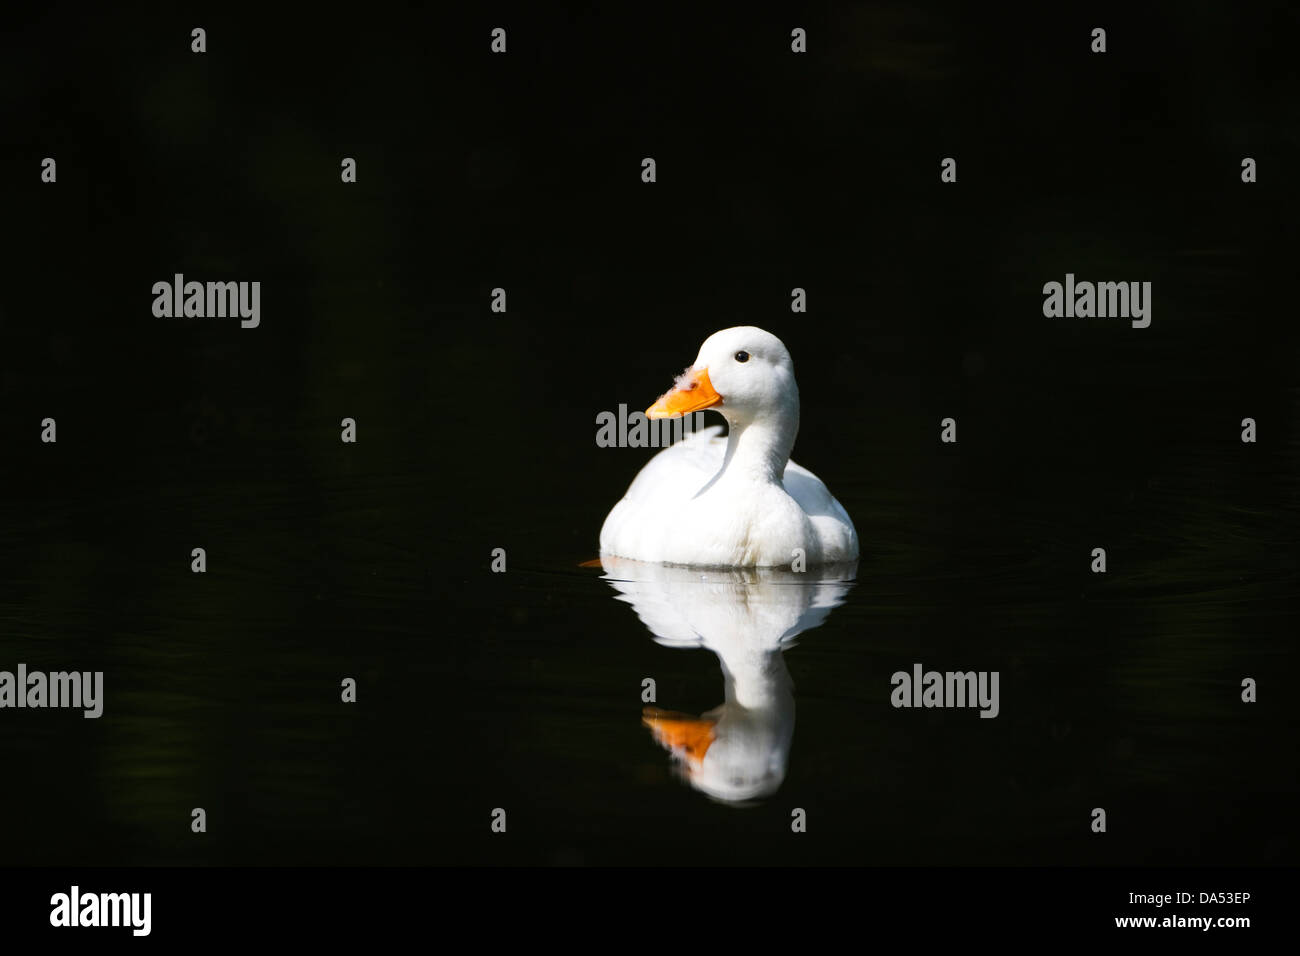 White Duck - Stock Image